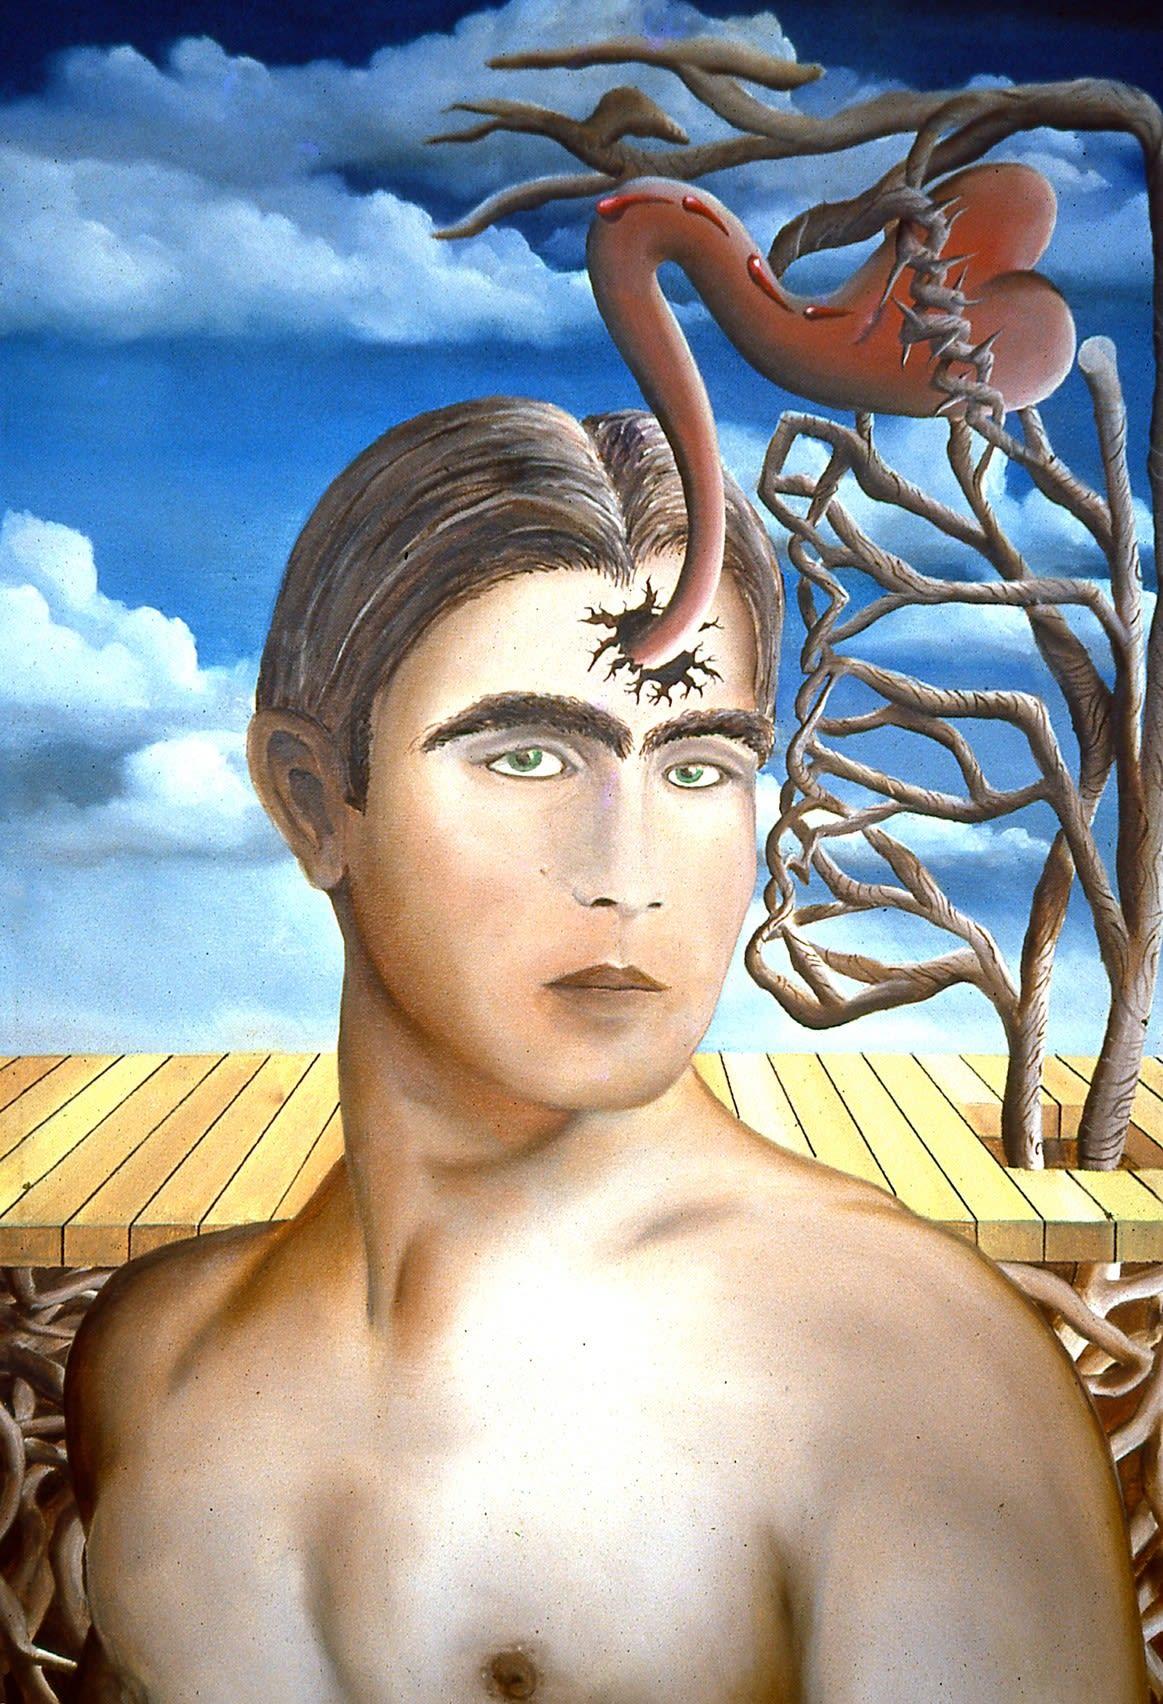 A Carlos Betancourt En La Arena Sabrosa Portraits00106